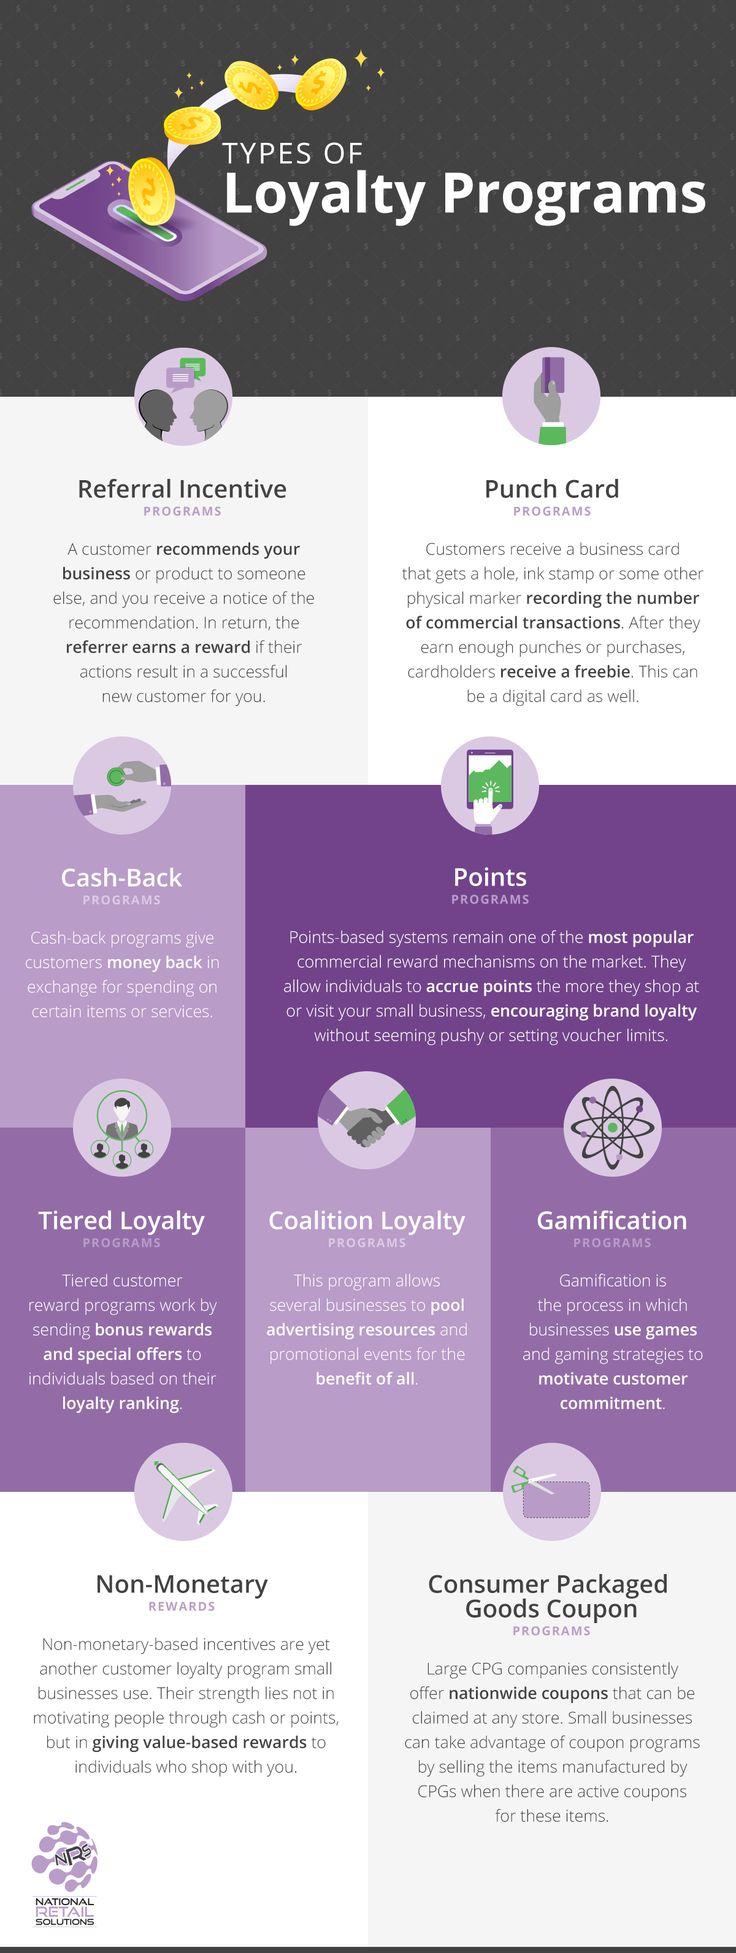 loyalty program types Customer loyalty program, Loyalty